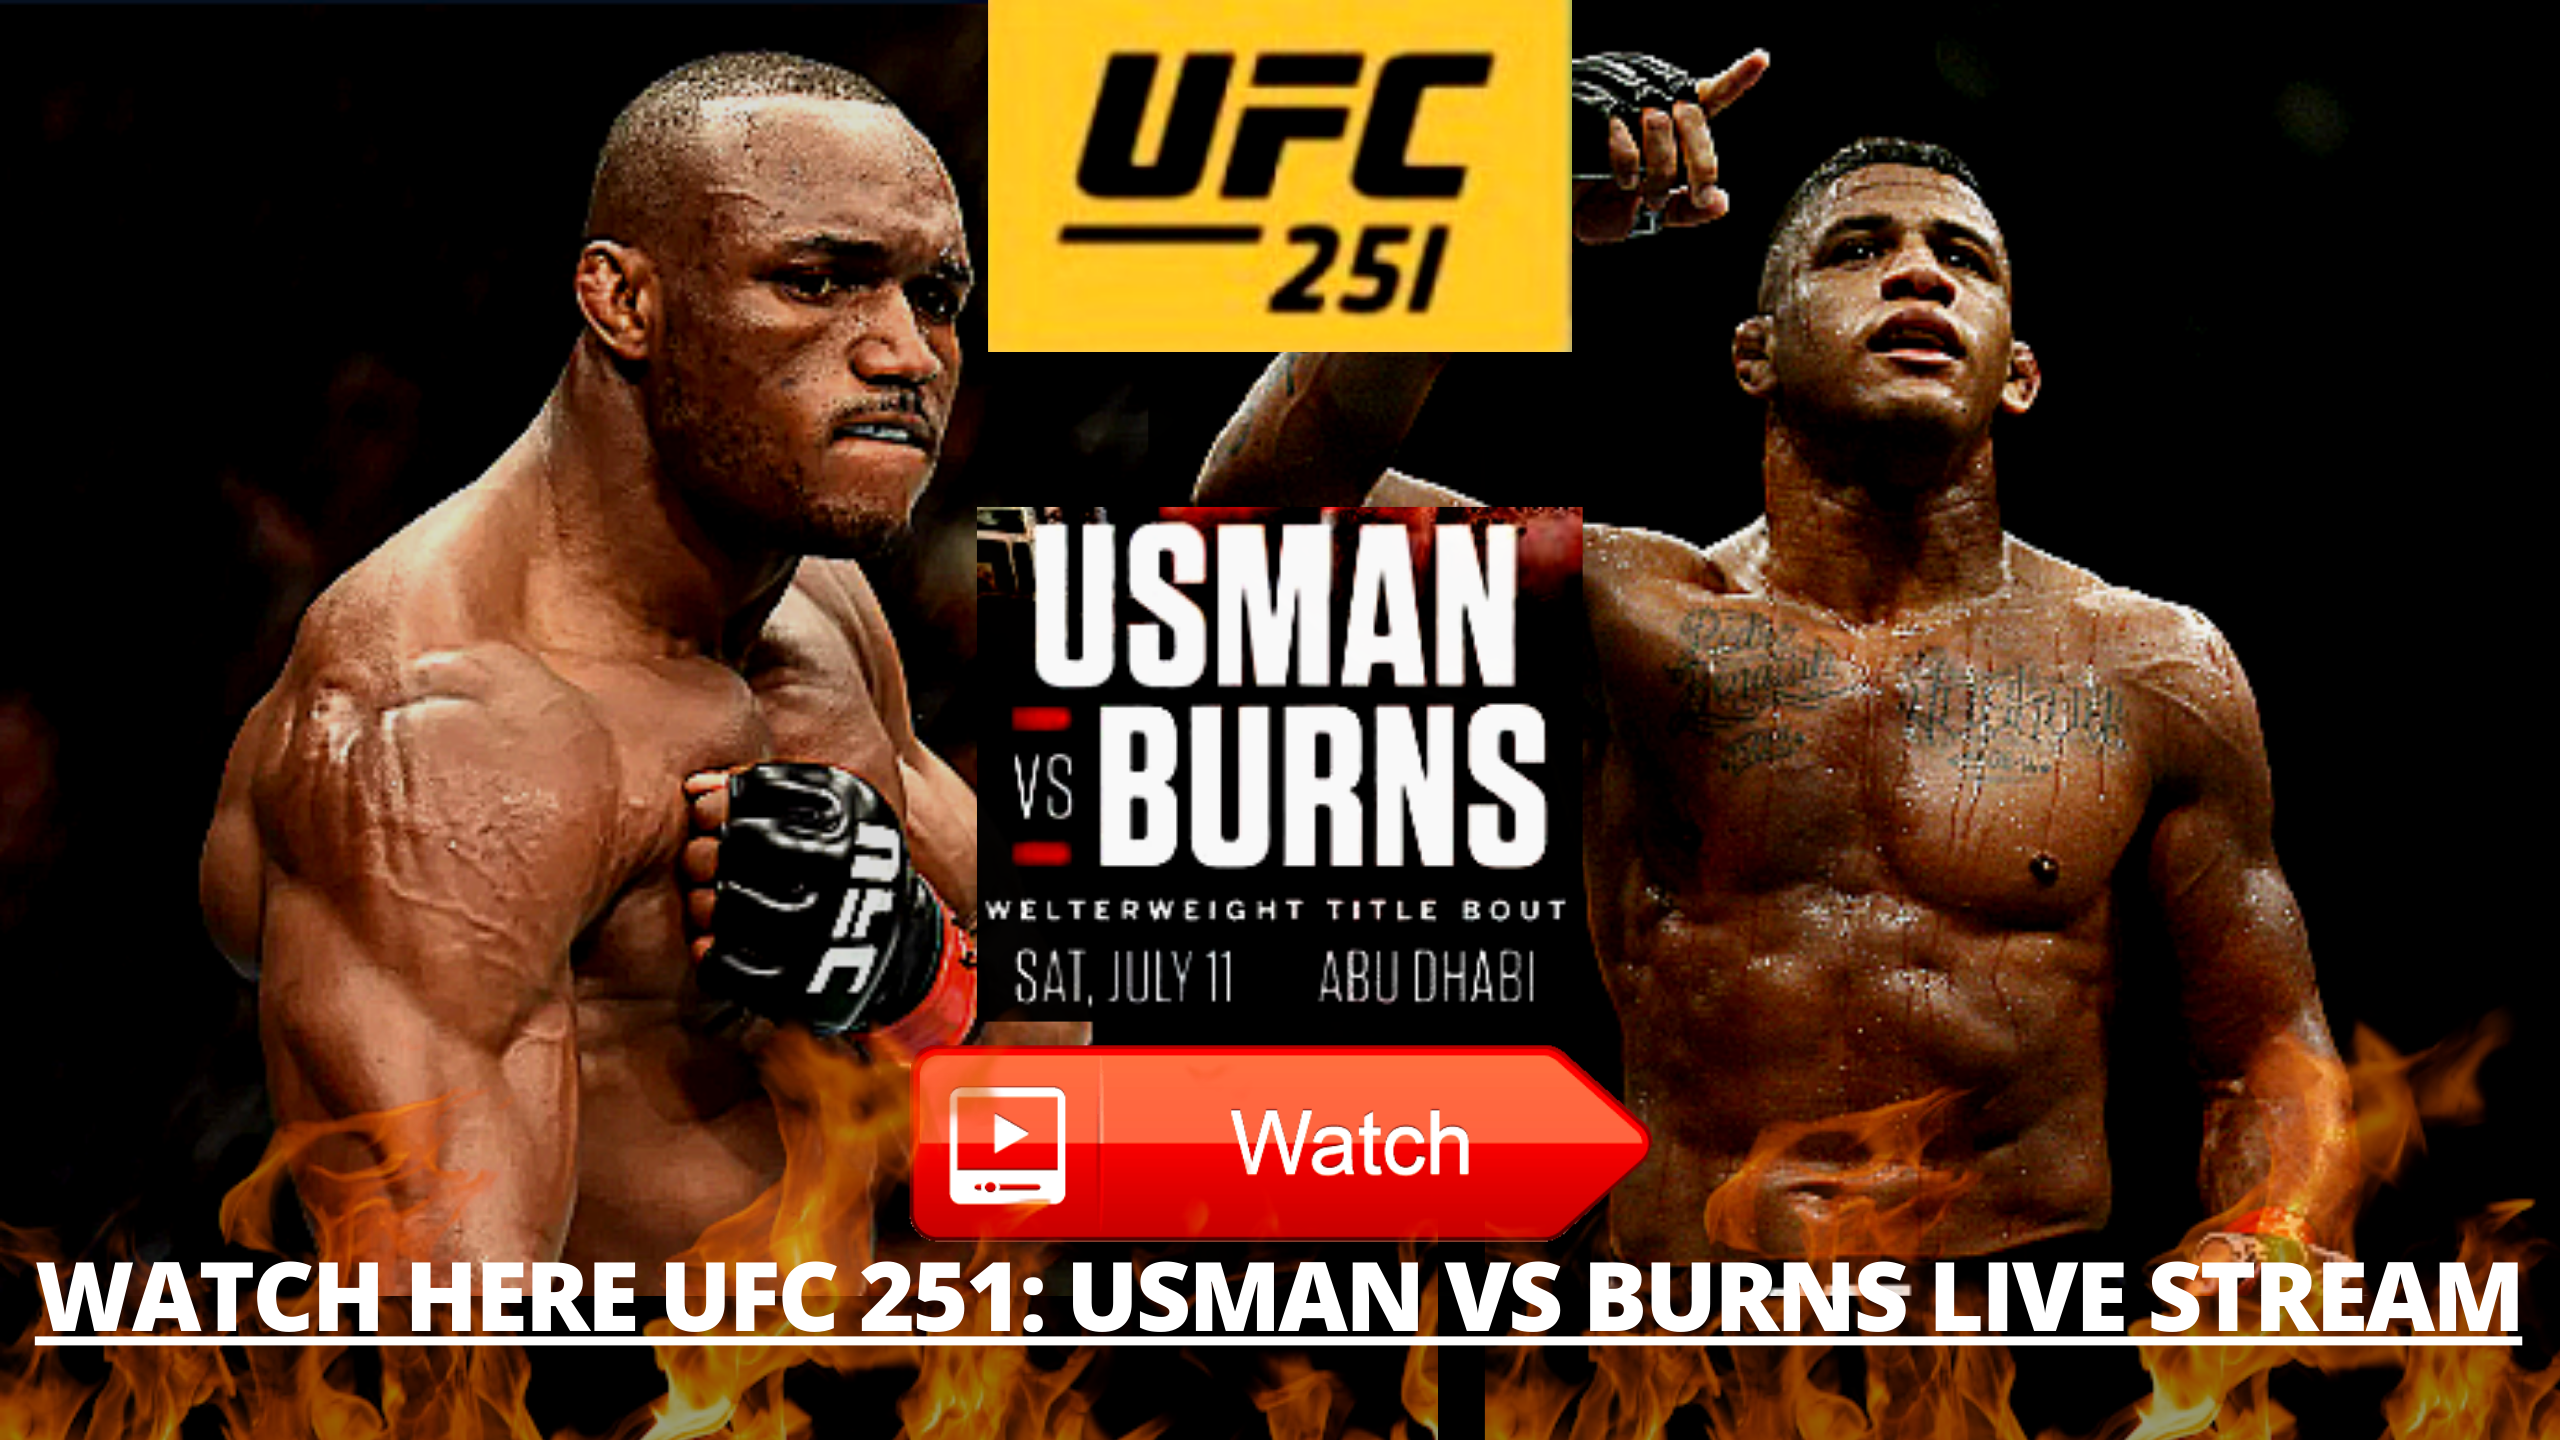 Live Ufc 251 Usman Vs Burns Live Kamaru Usman Vs Gilbert Burns Live Stream Ufc 251 En Vivo In 2020 Ufc Live Streaming Boxing Live